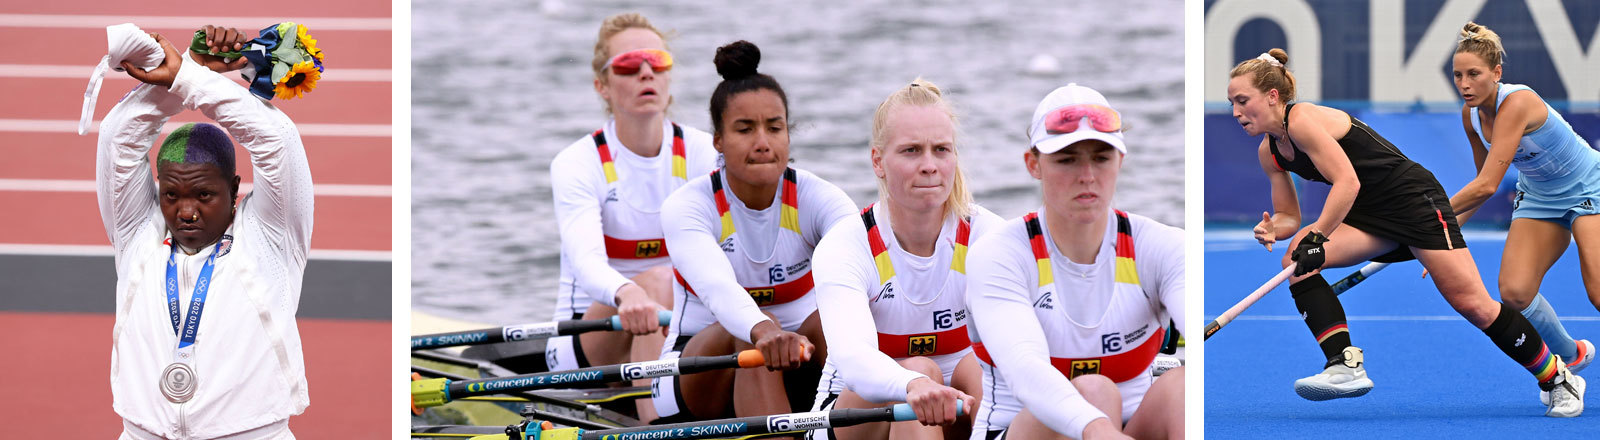 Olympische Spiele 2021: Raven Saunders, Nike Lorenz, Carlotta Nwajide